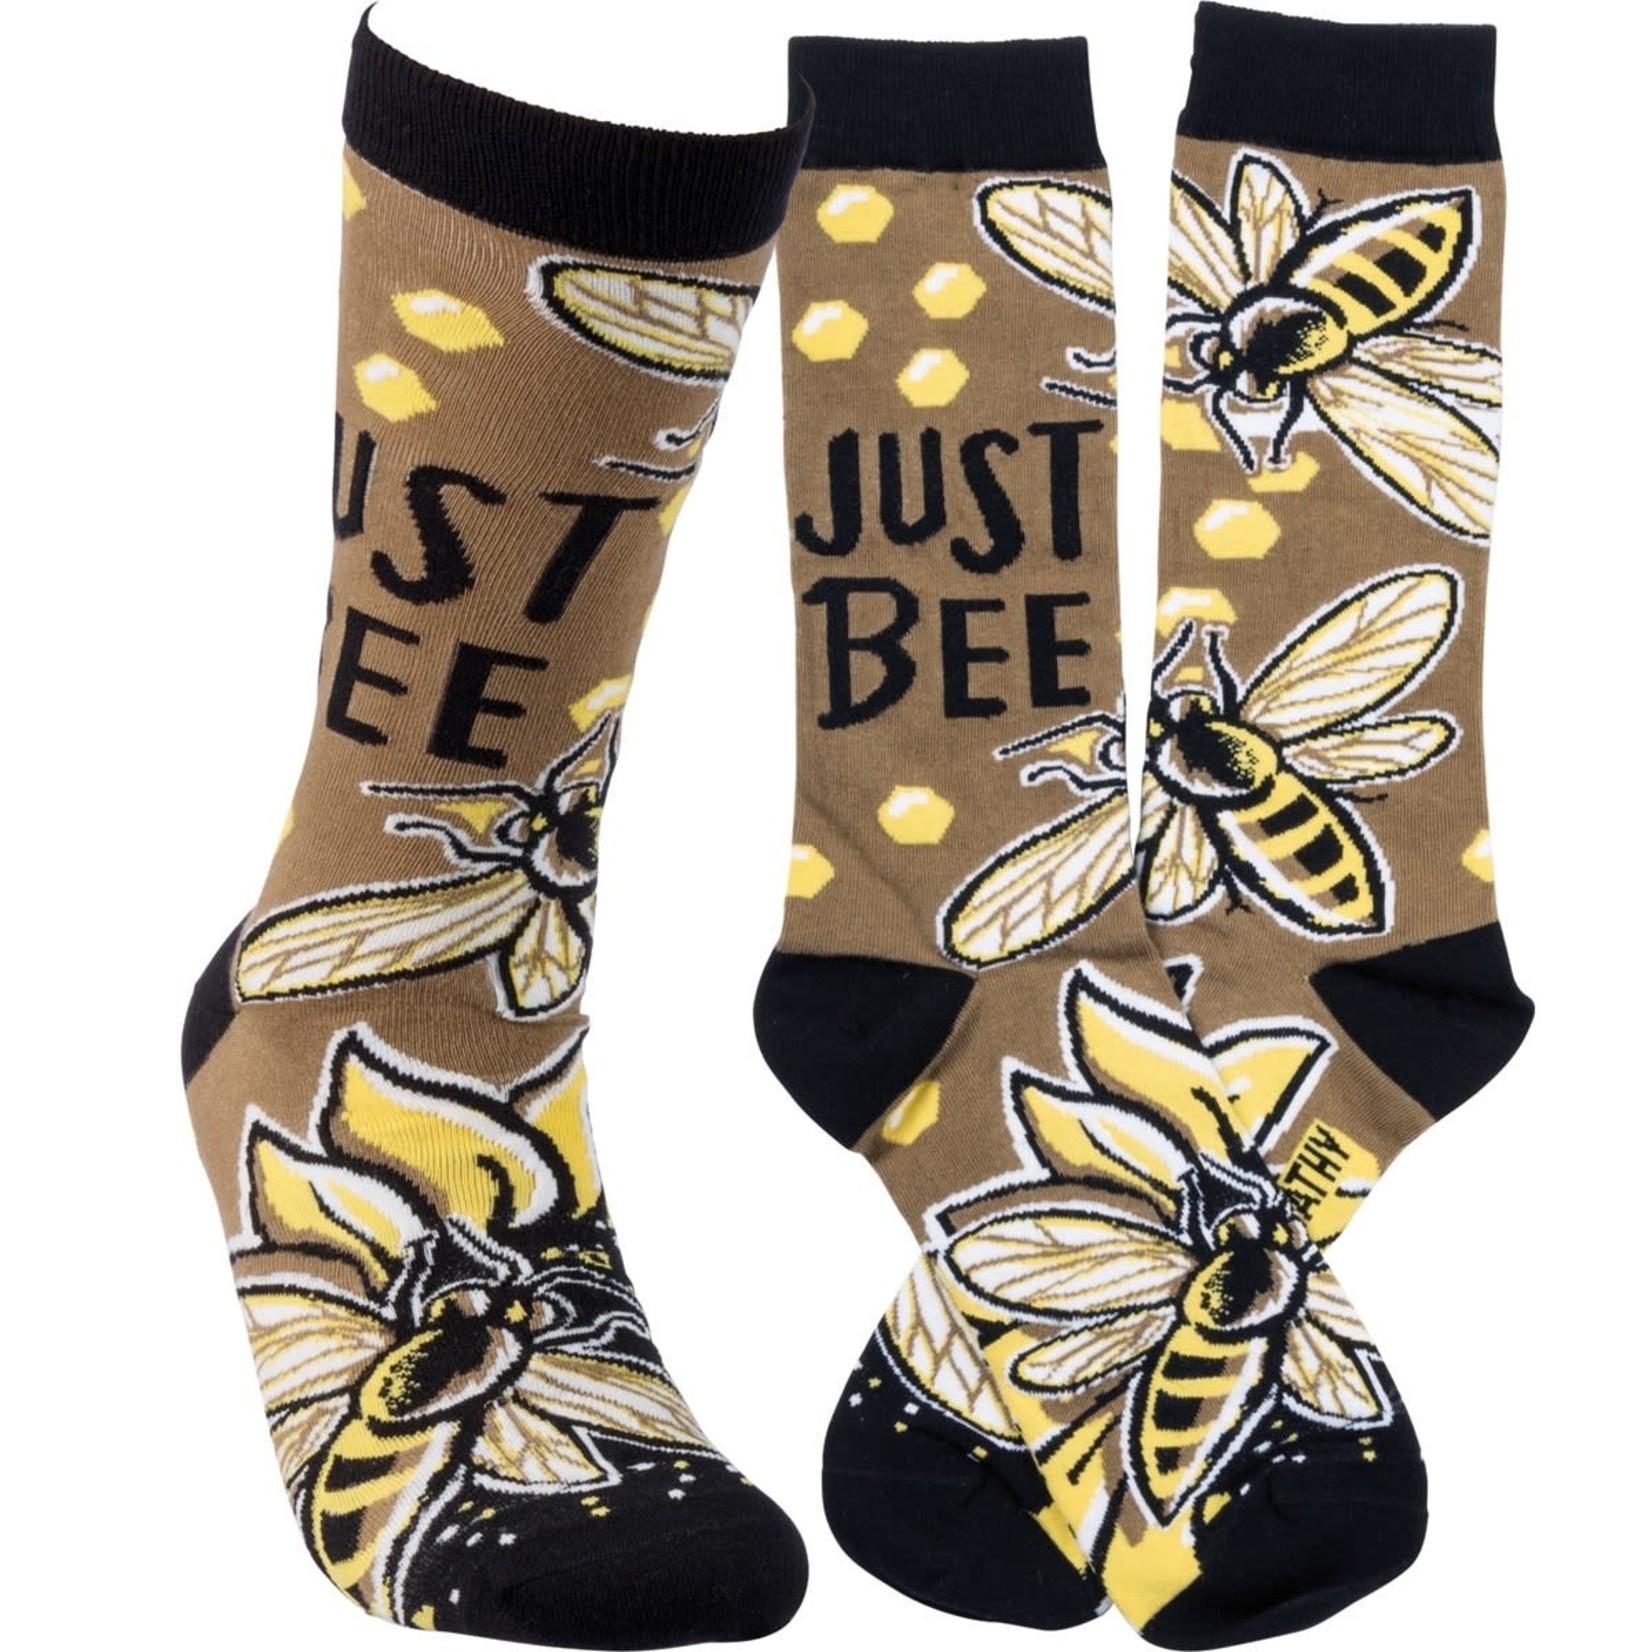 Primitives by Kathy Socks: Just Bee